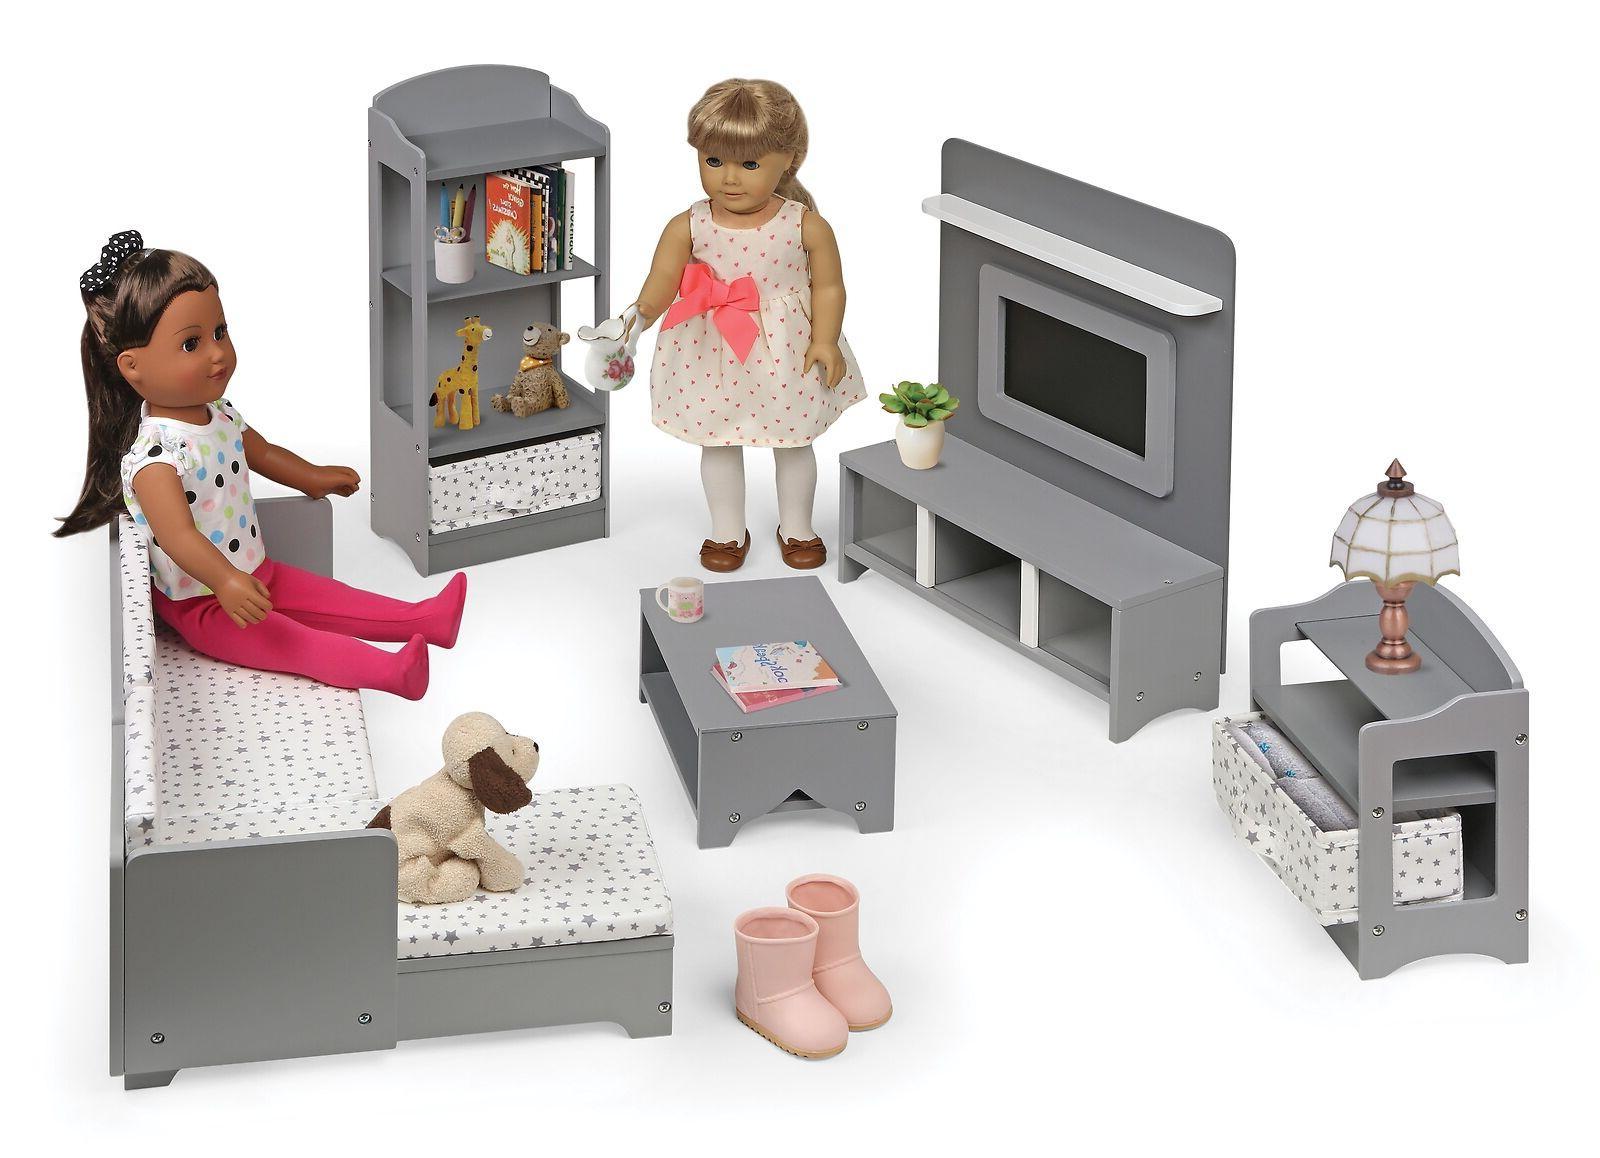 doll house furniture set fits 18 dolls